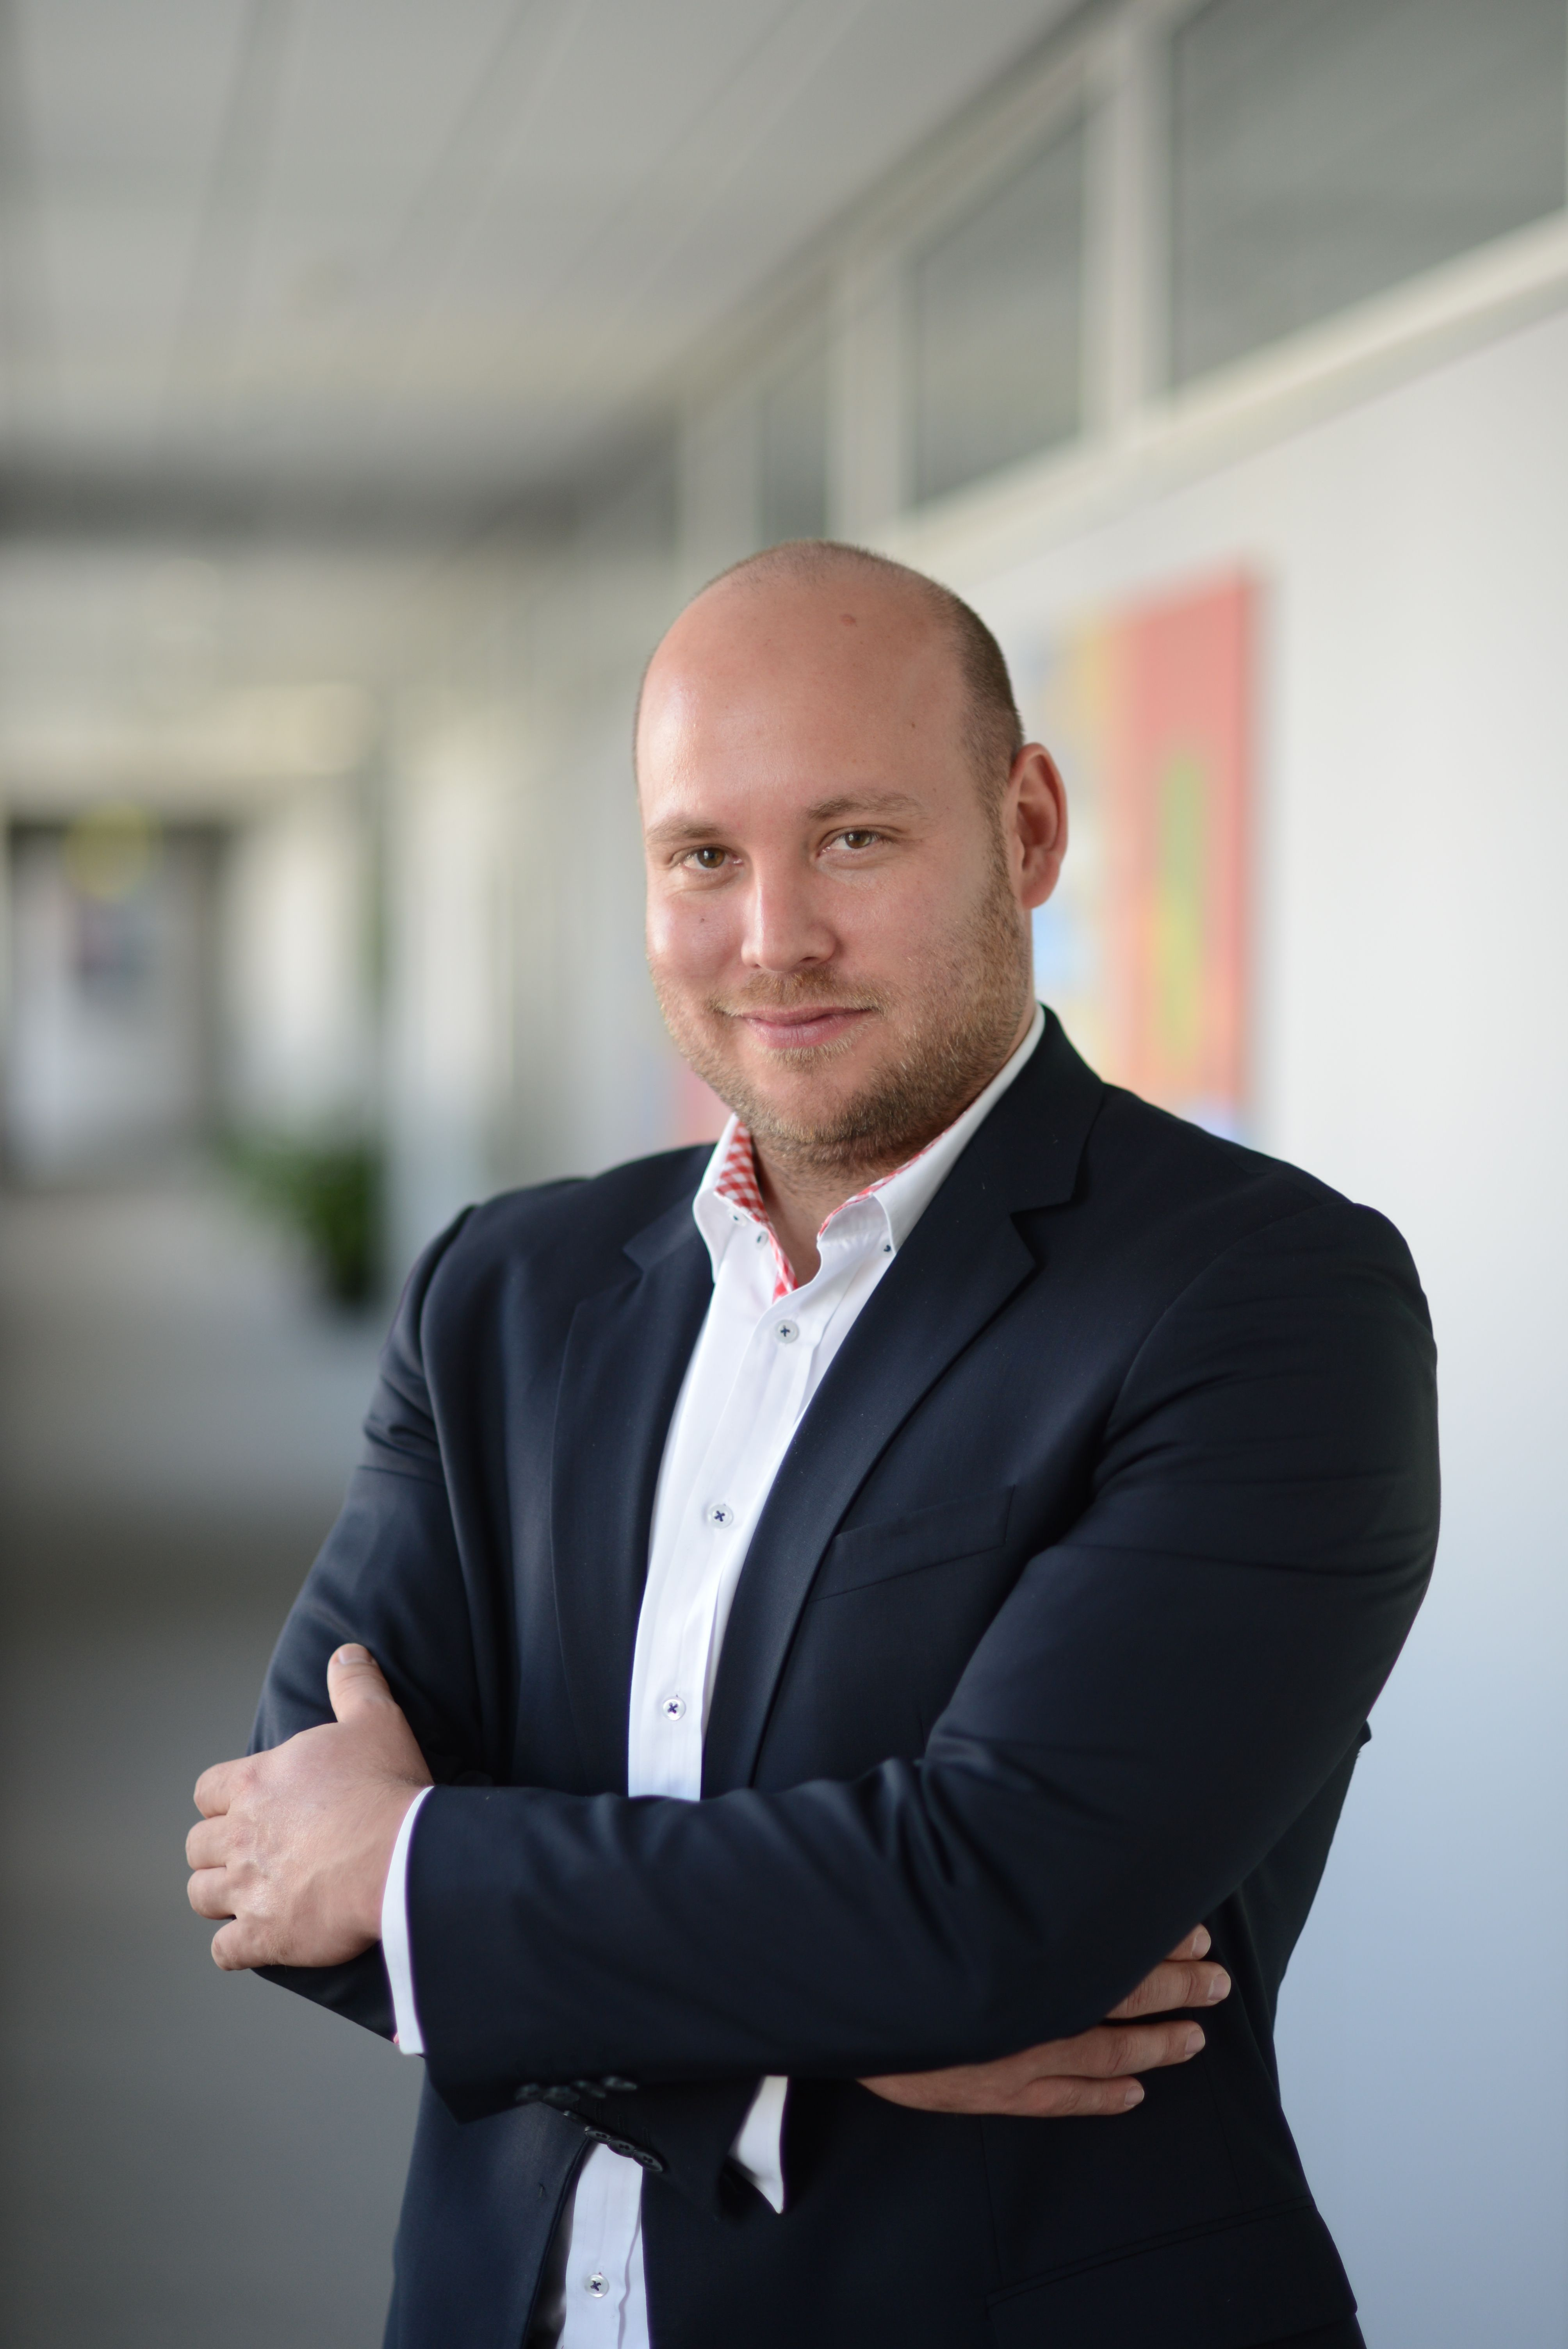 Philipp Möller martin philipp möller horcher pr gmbh